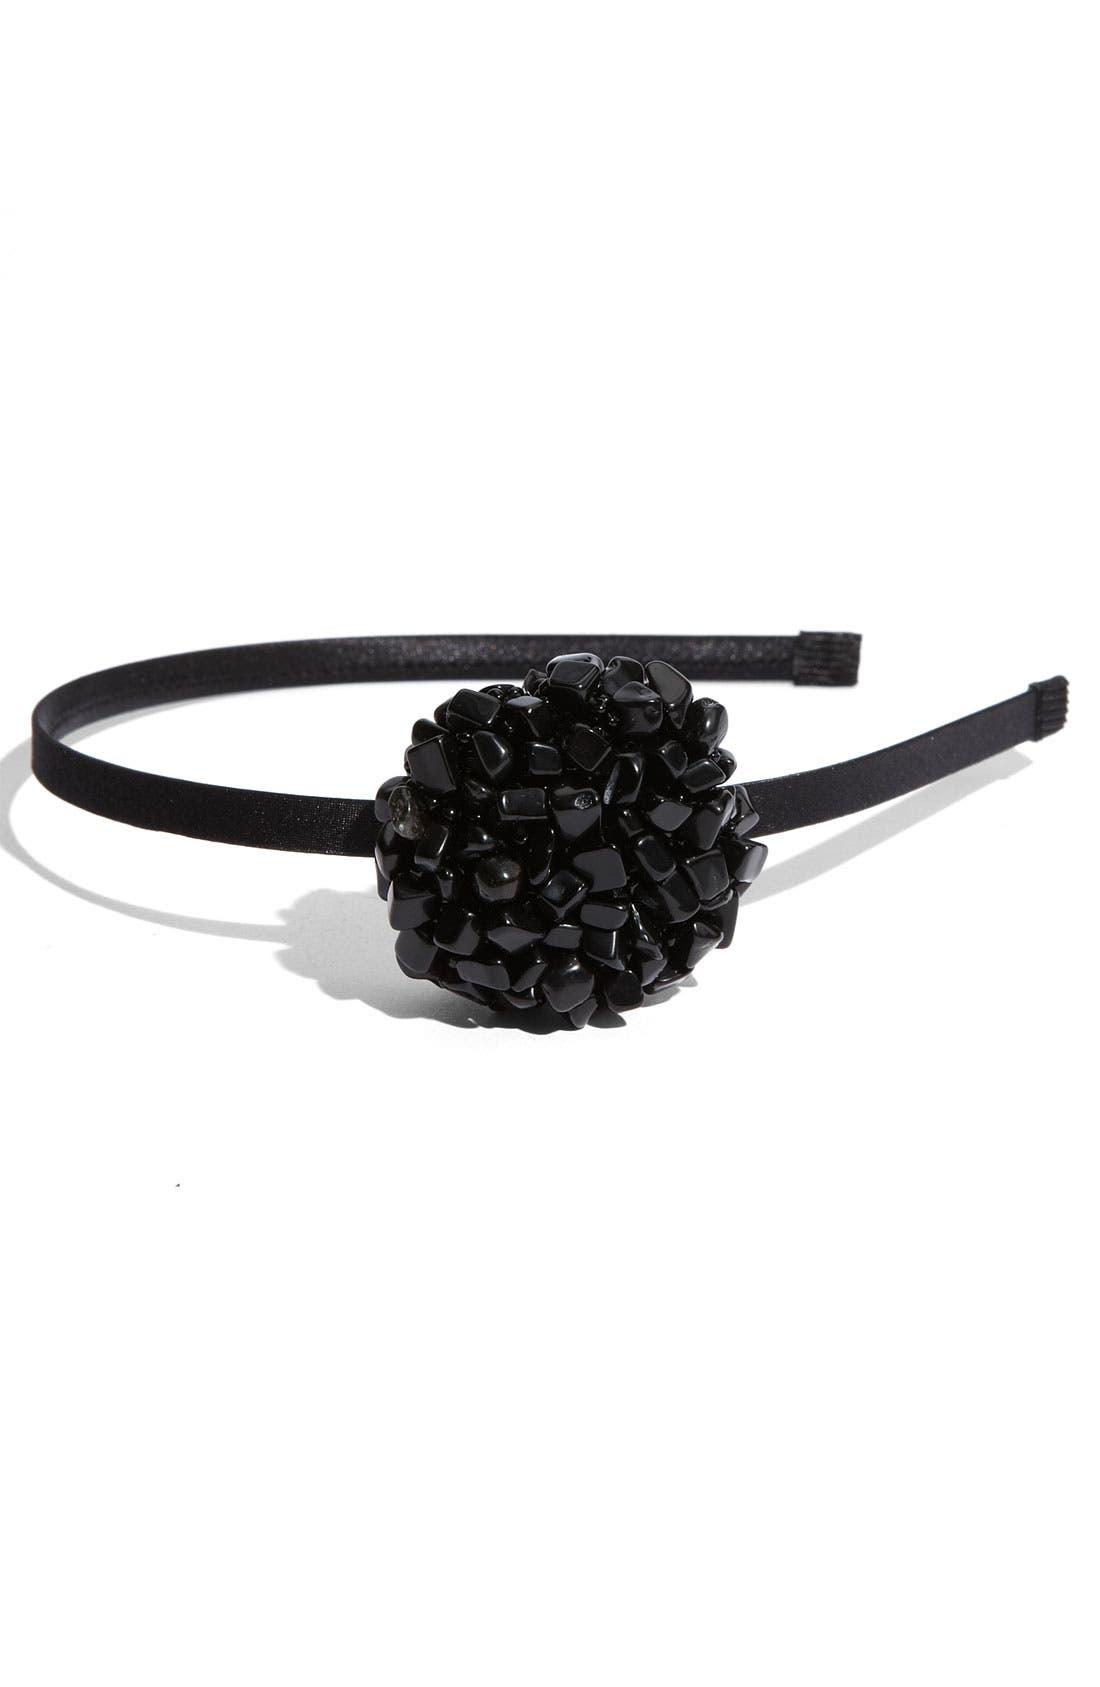 Main Image - Tasha 'Rocken' Headband